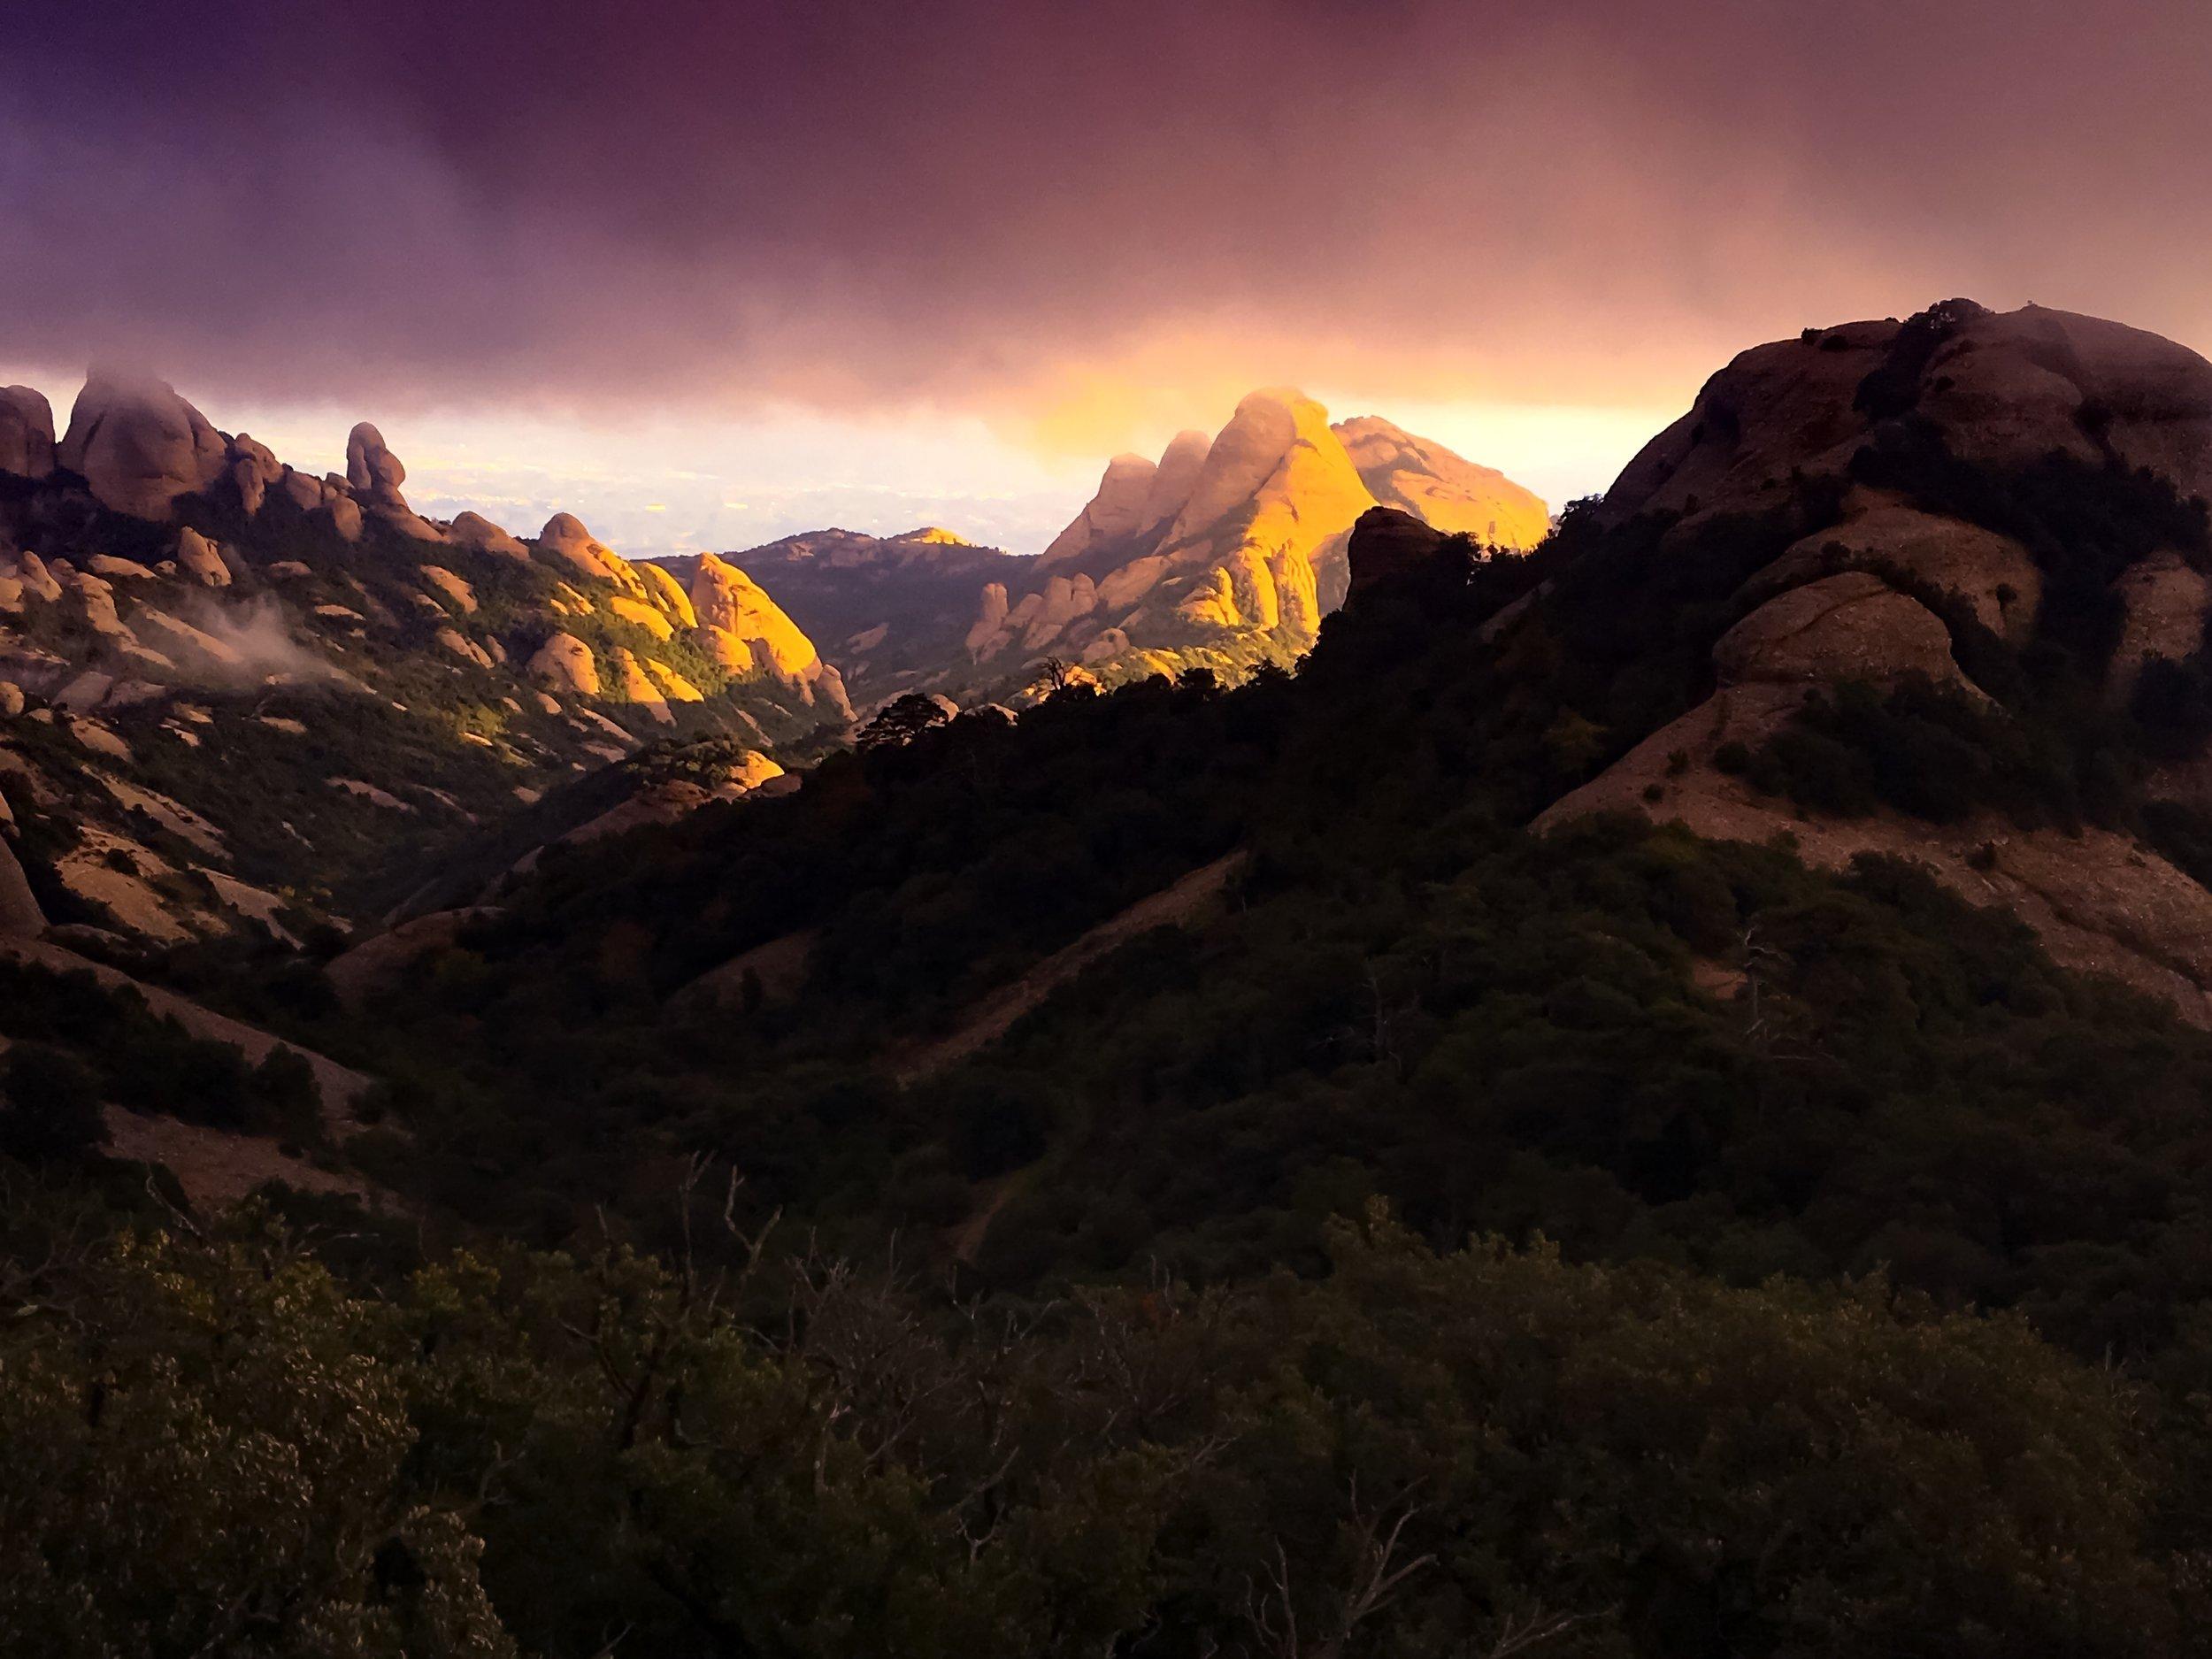 Montserrat i solnedgång